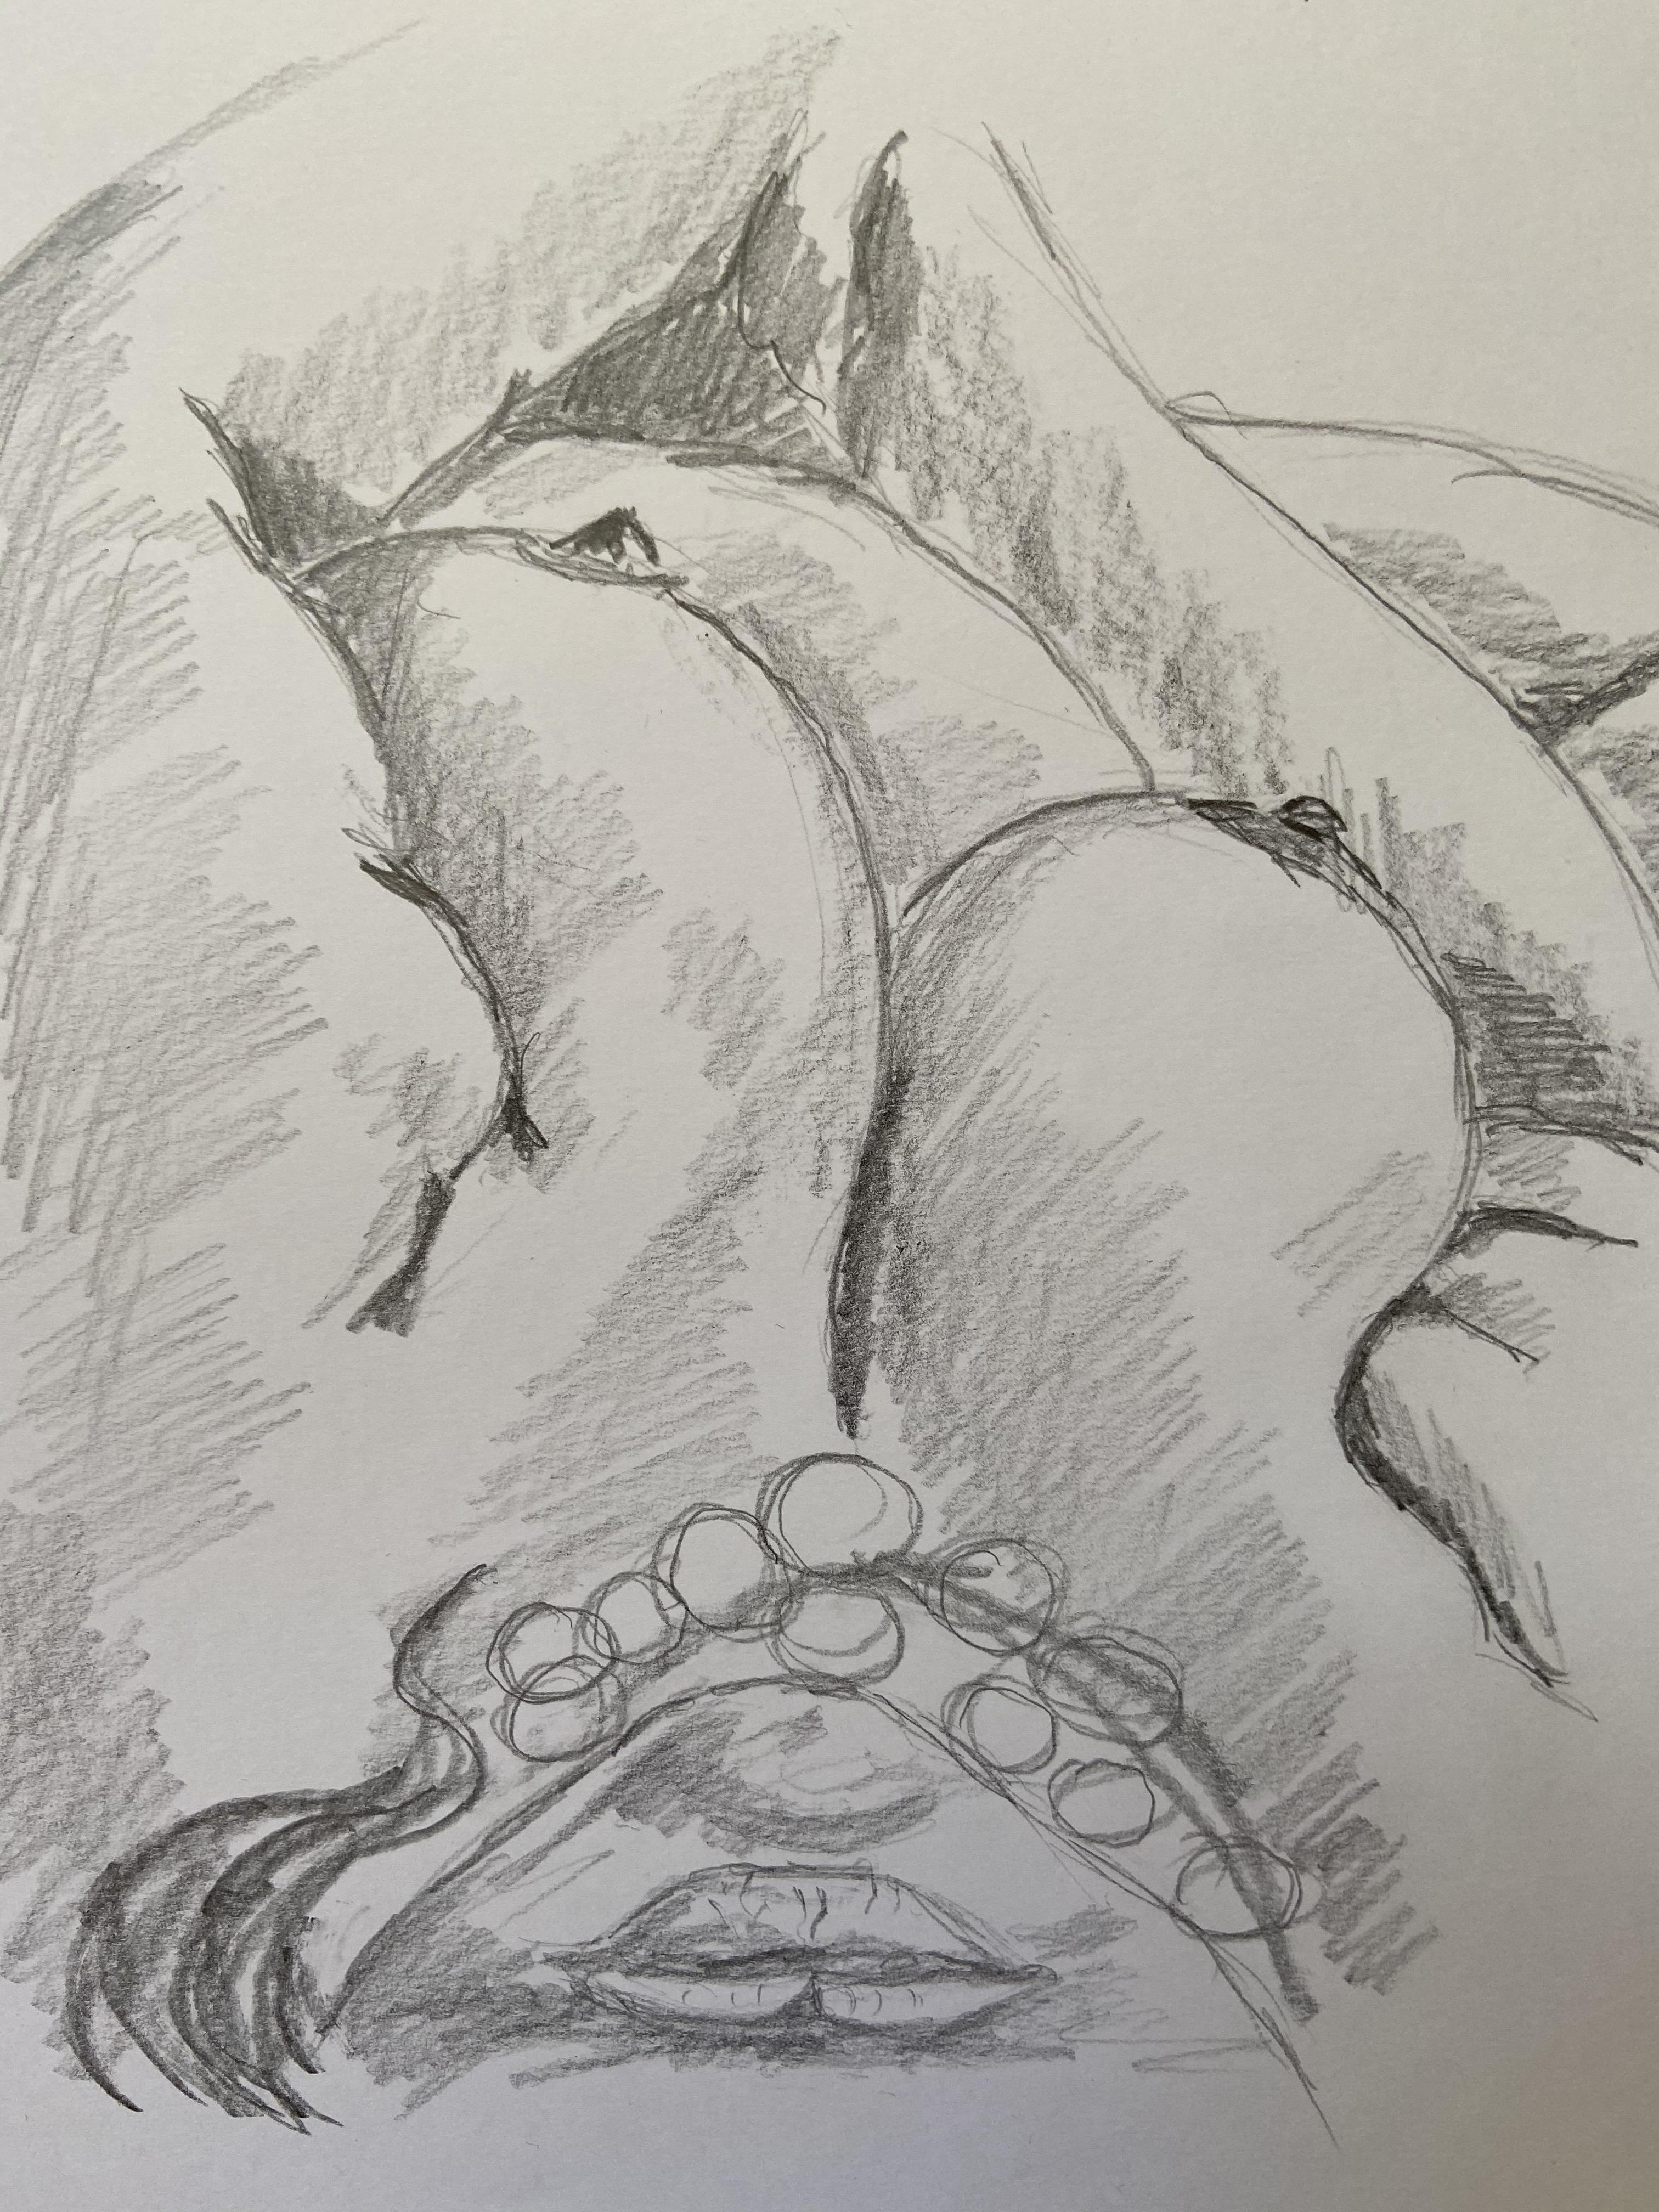 gros plan dessin crayon de papier hachure   cours de dessin